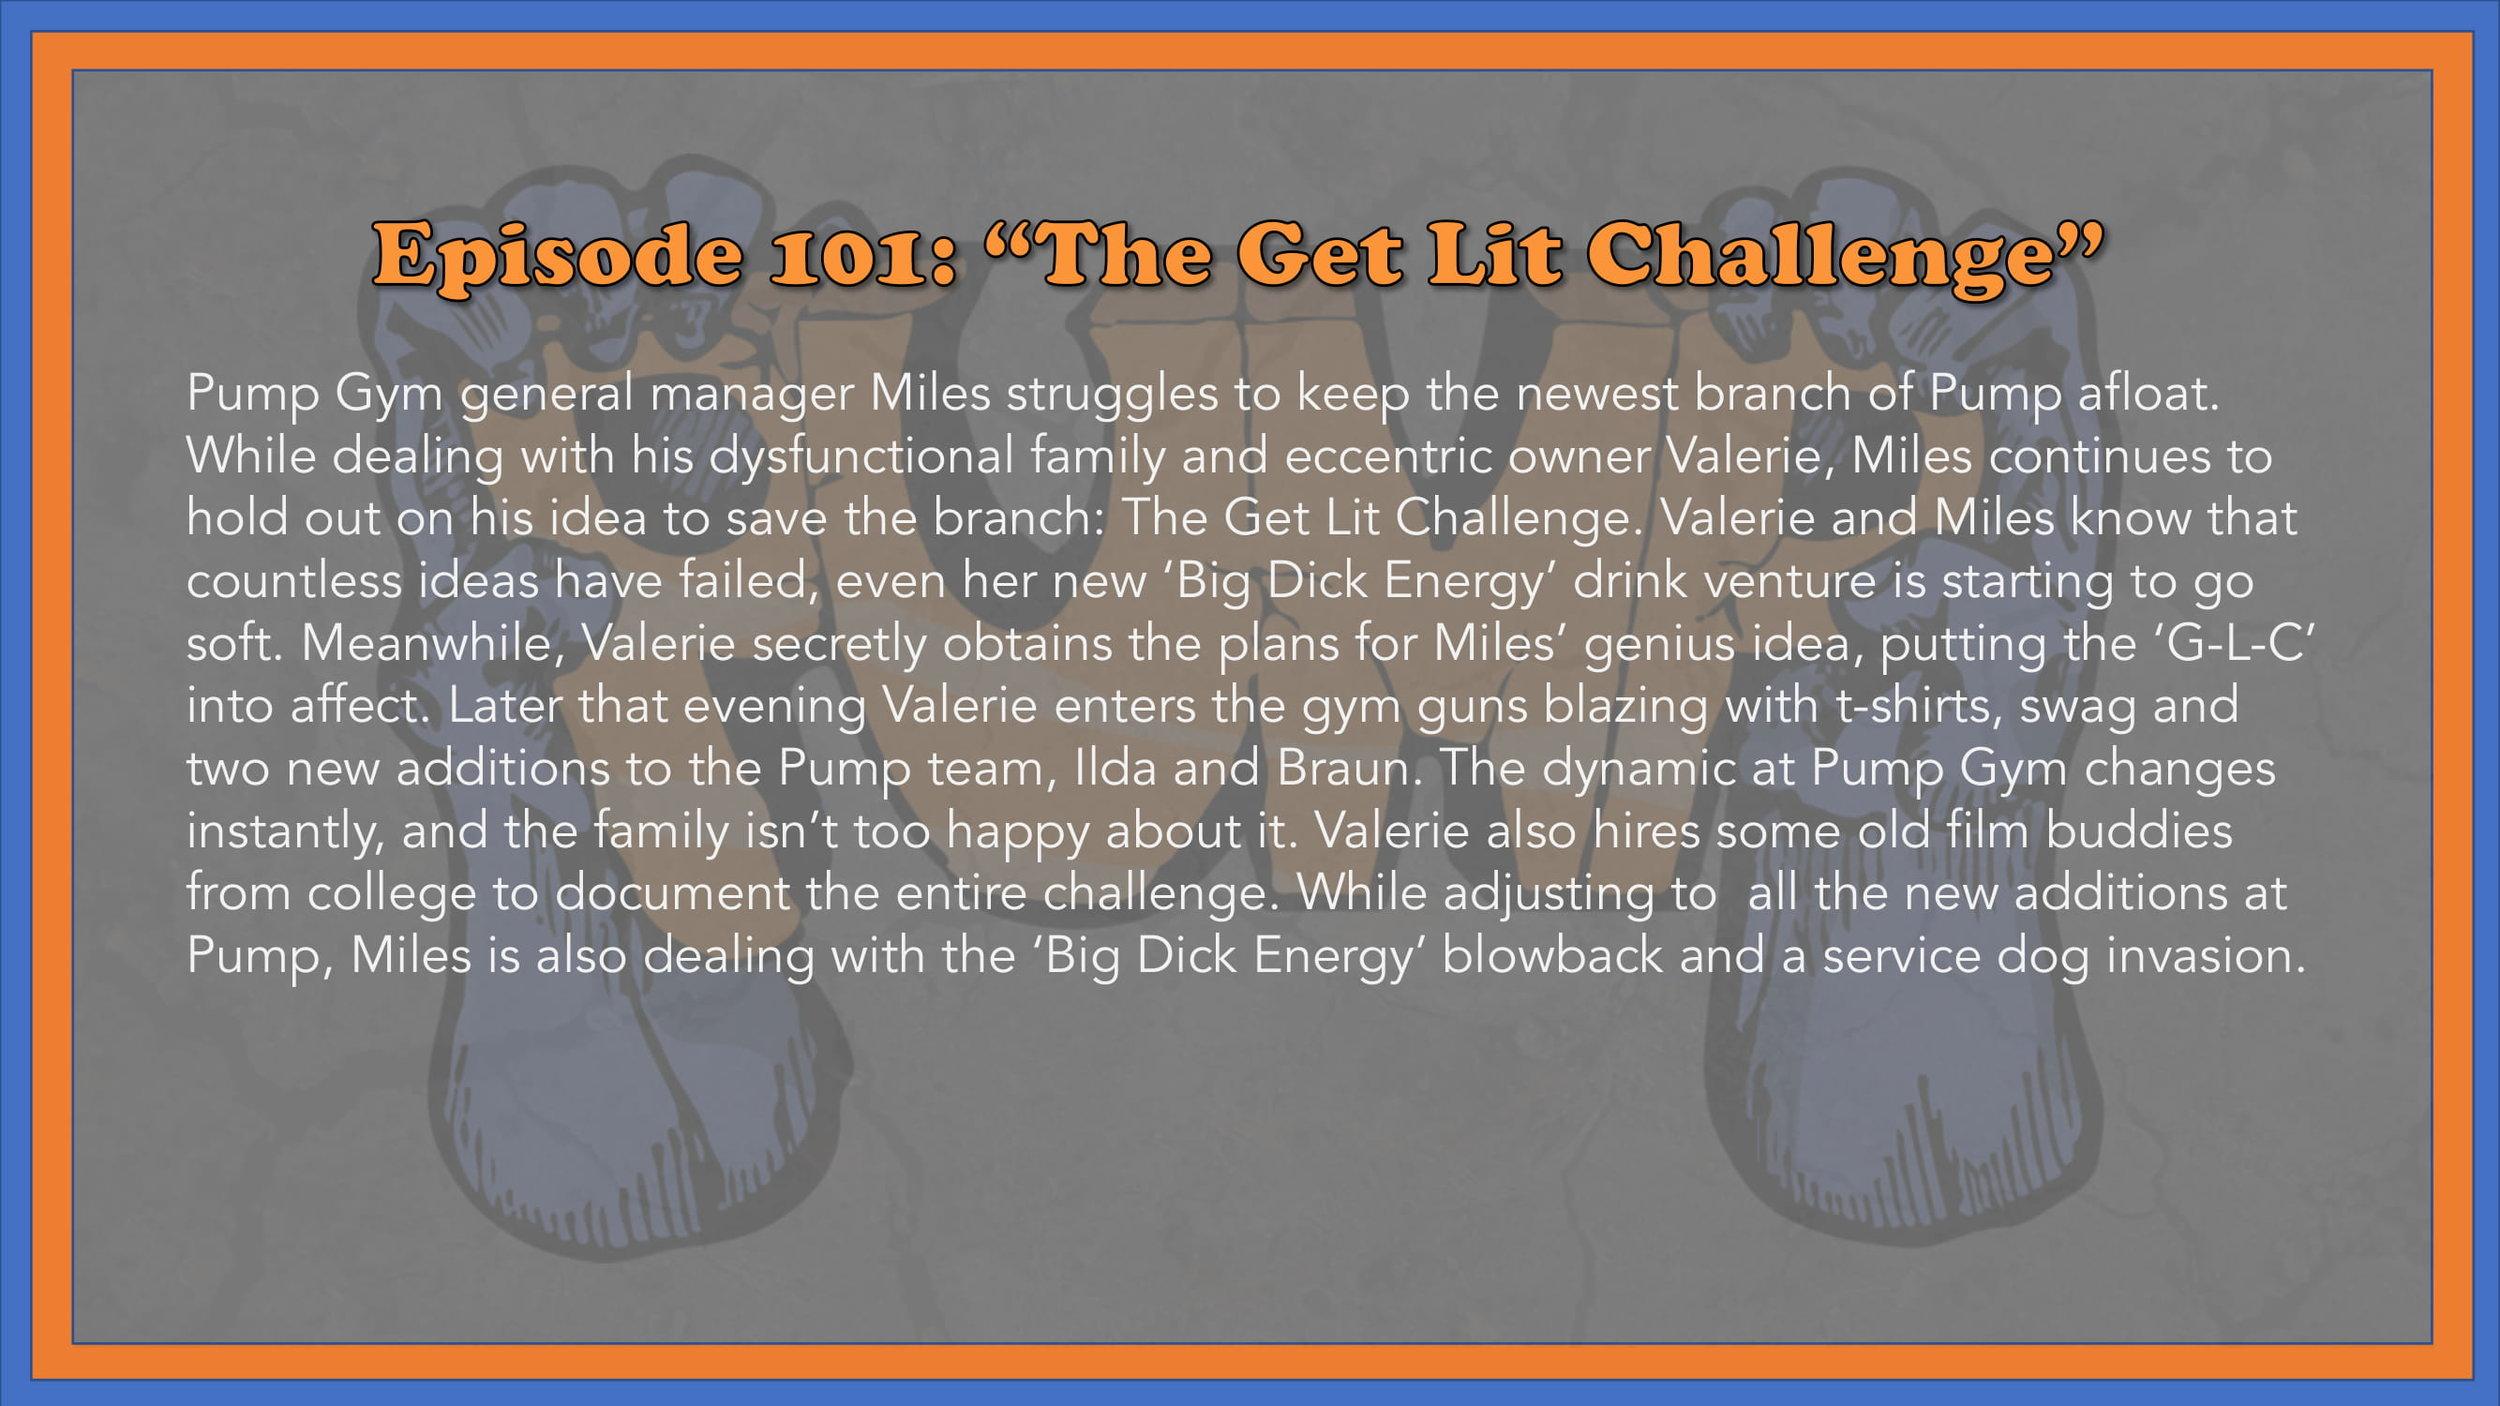 Pump Episode Outlines Season One 120618-2.jpg